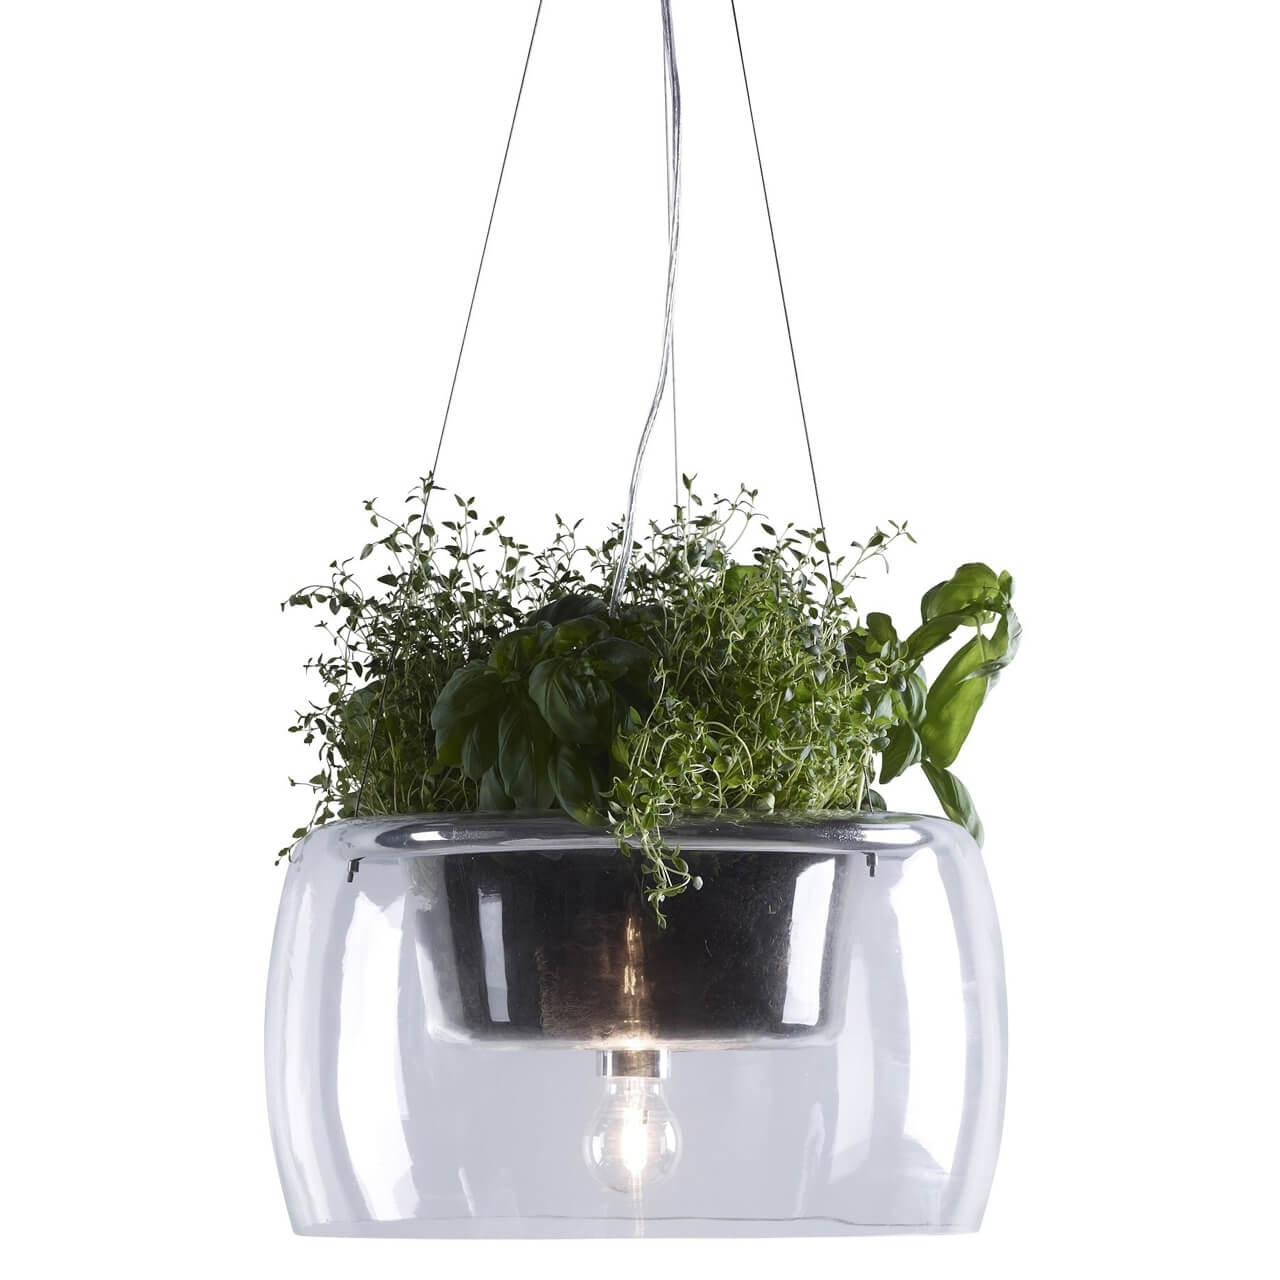 Светильник Markslojd 105328 Plant подвесной светильник markslojd stromstad 105246